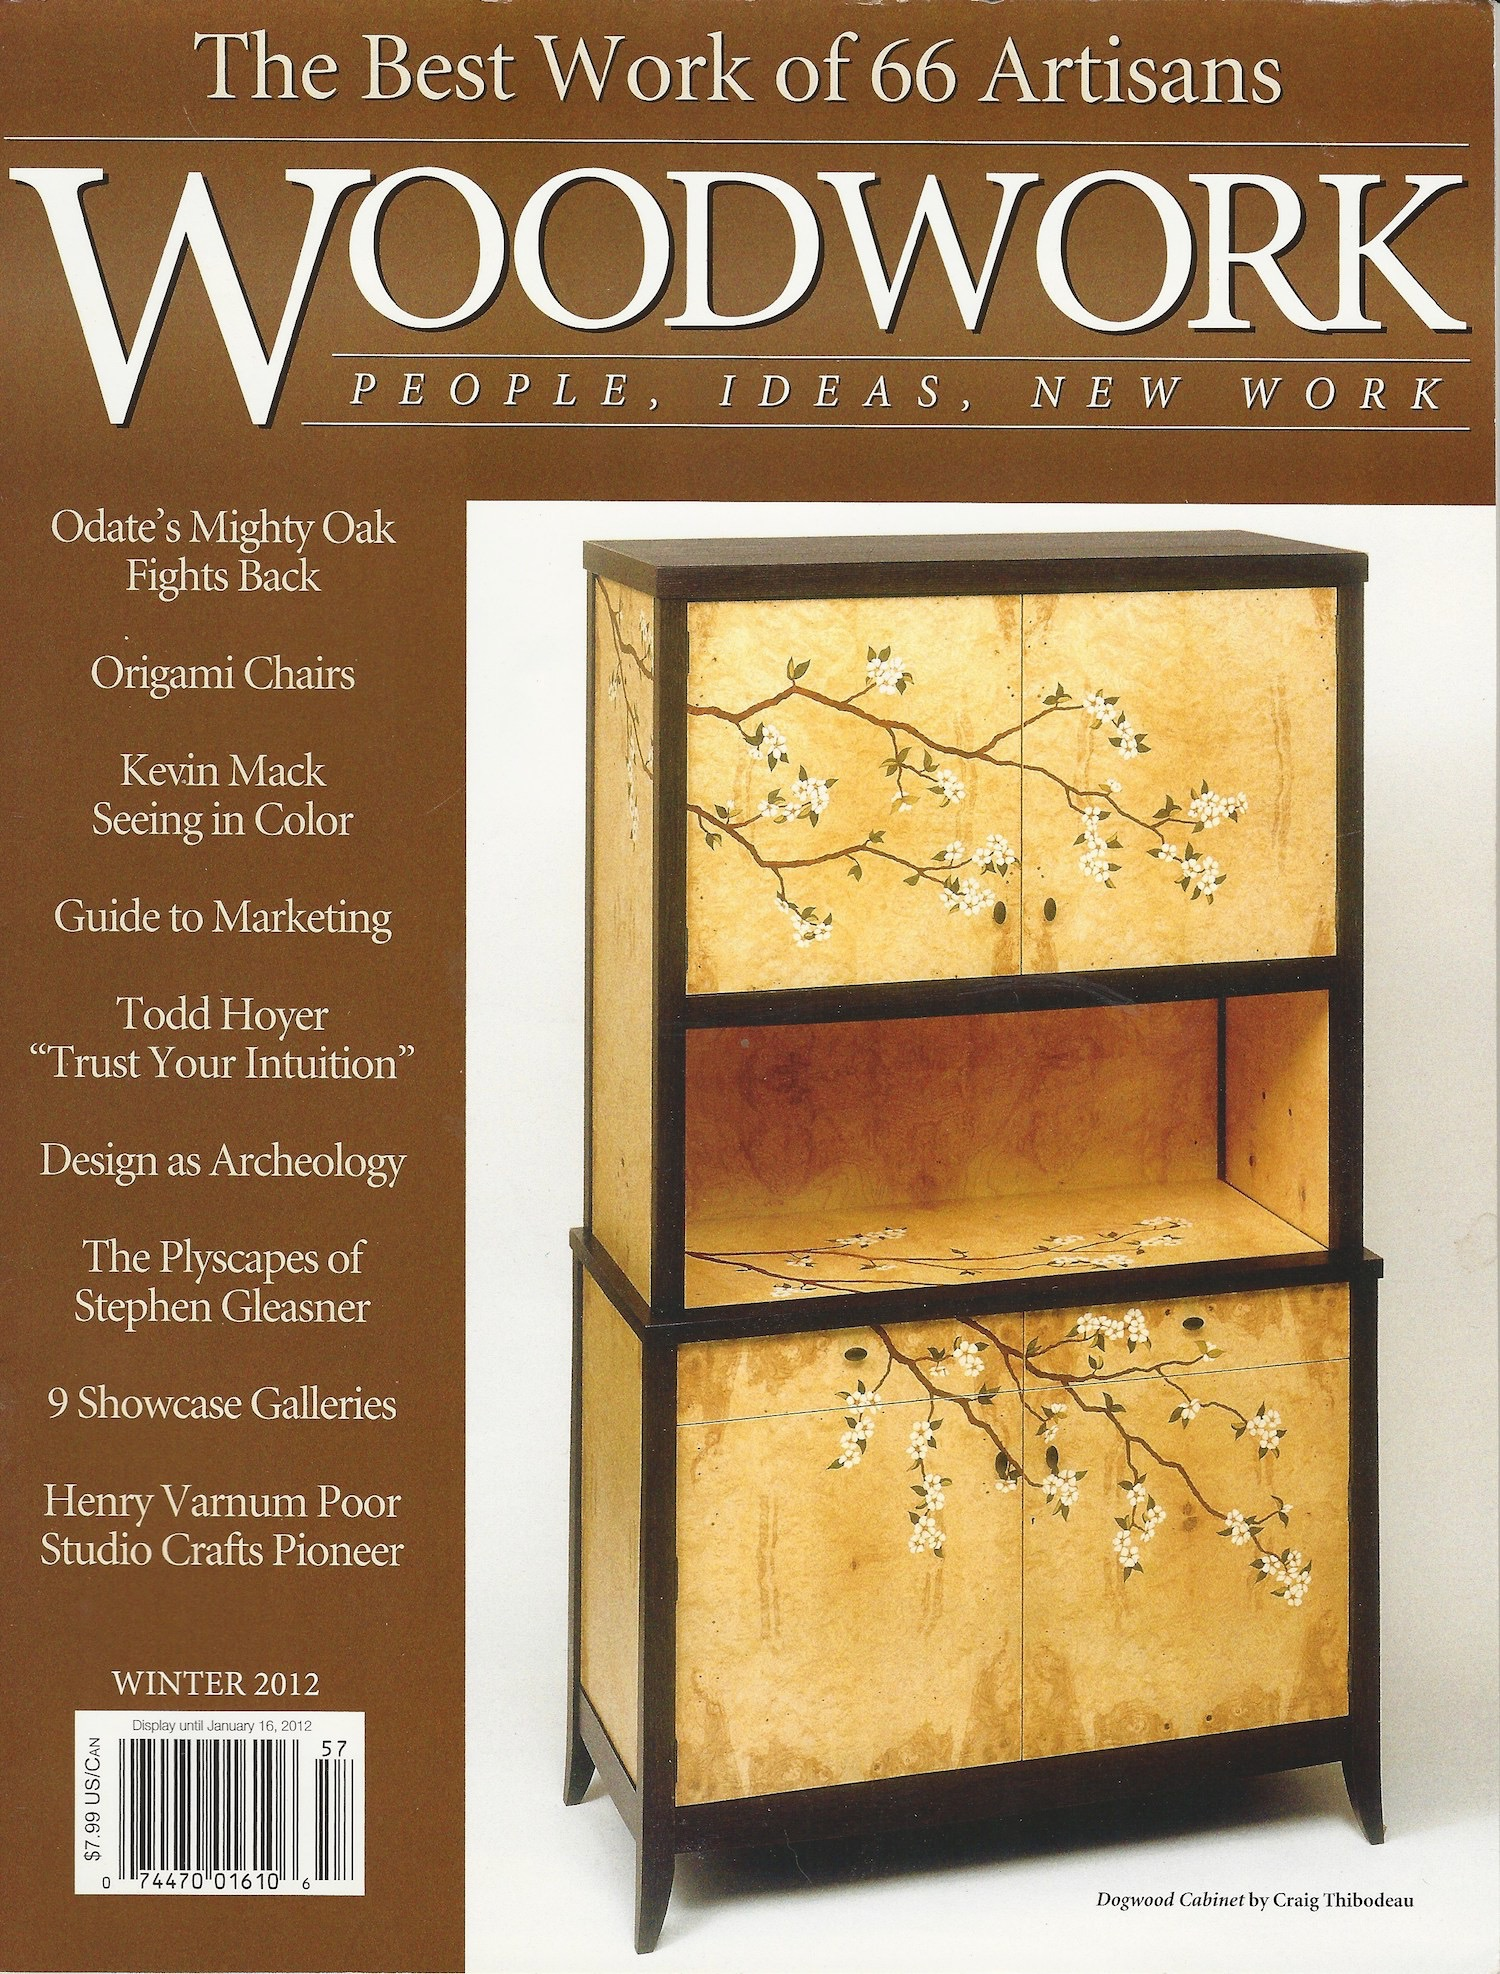 woodwork cover.jpg